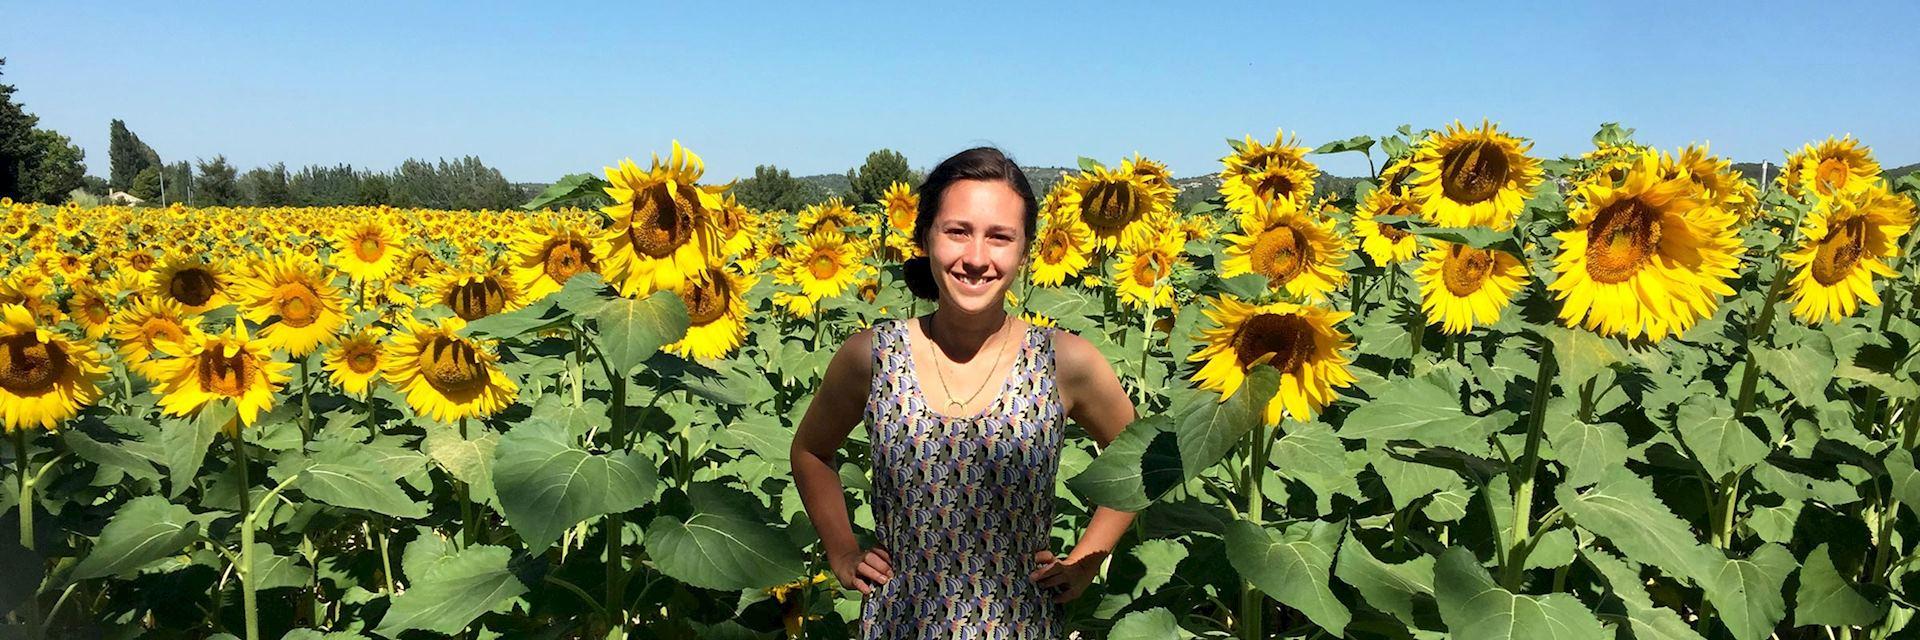 Careese in sunflower fields, France